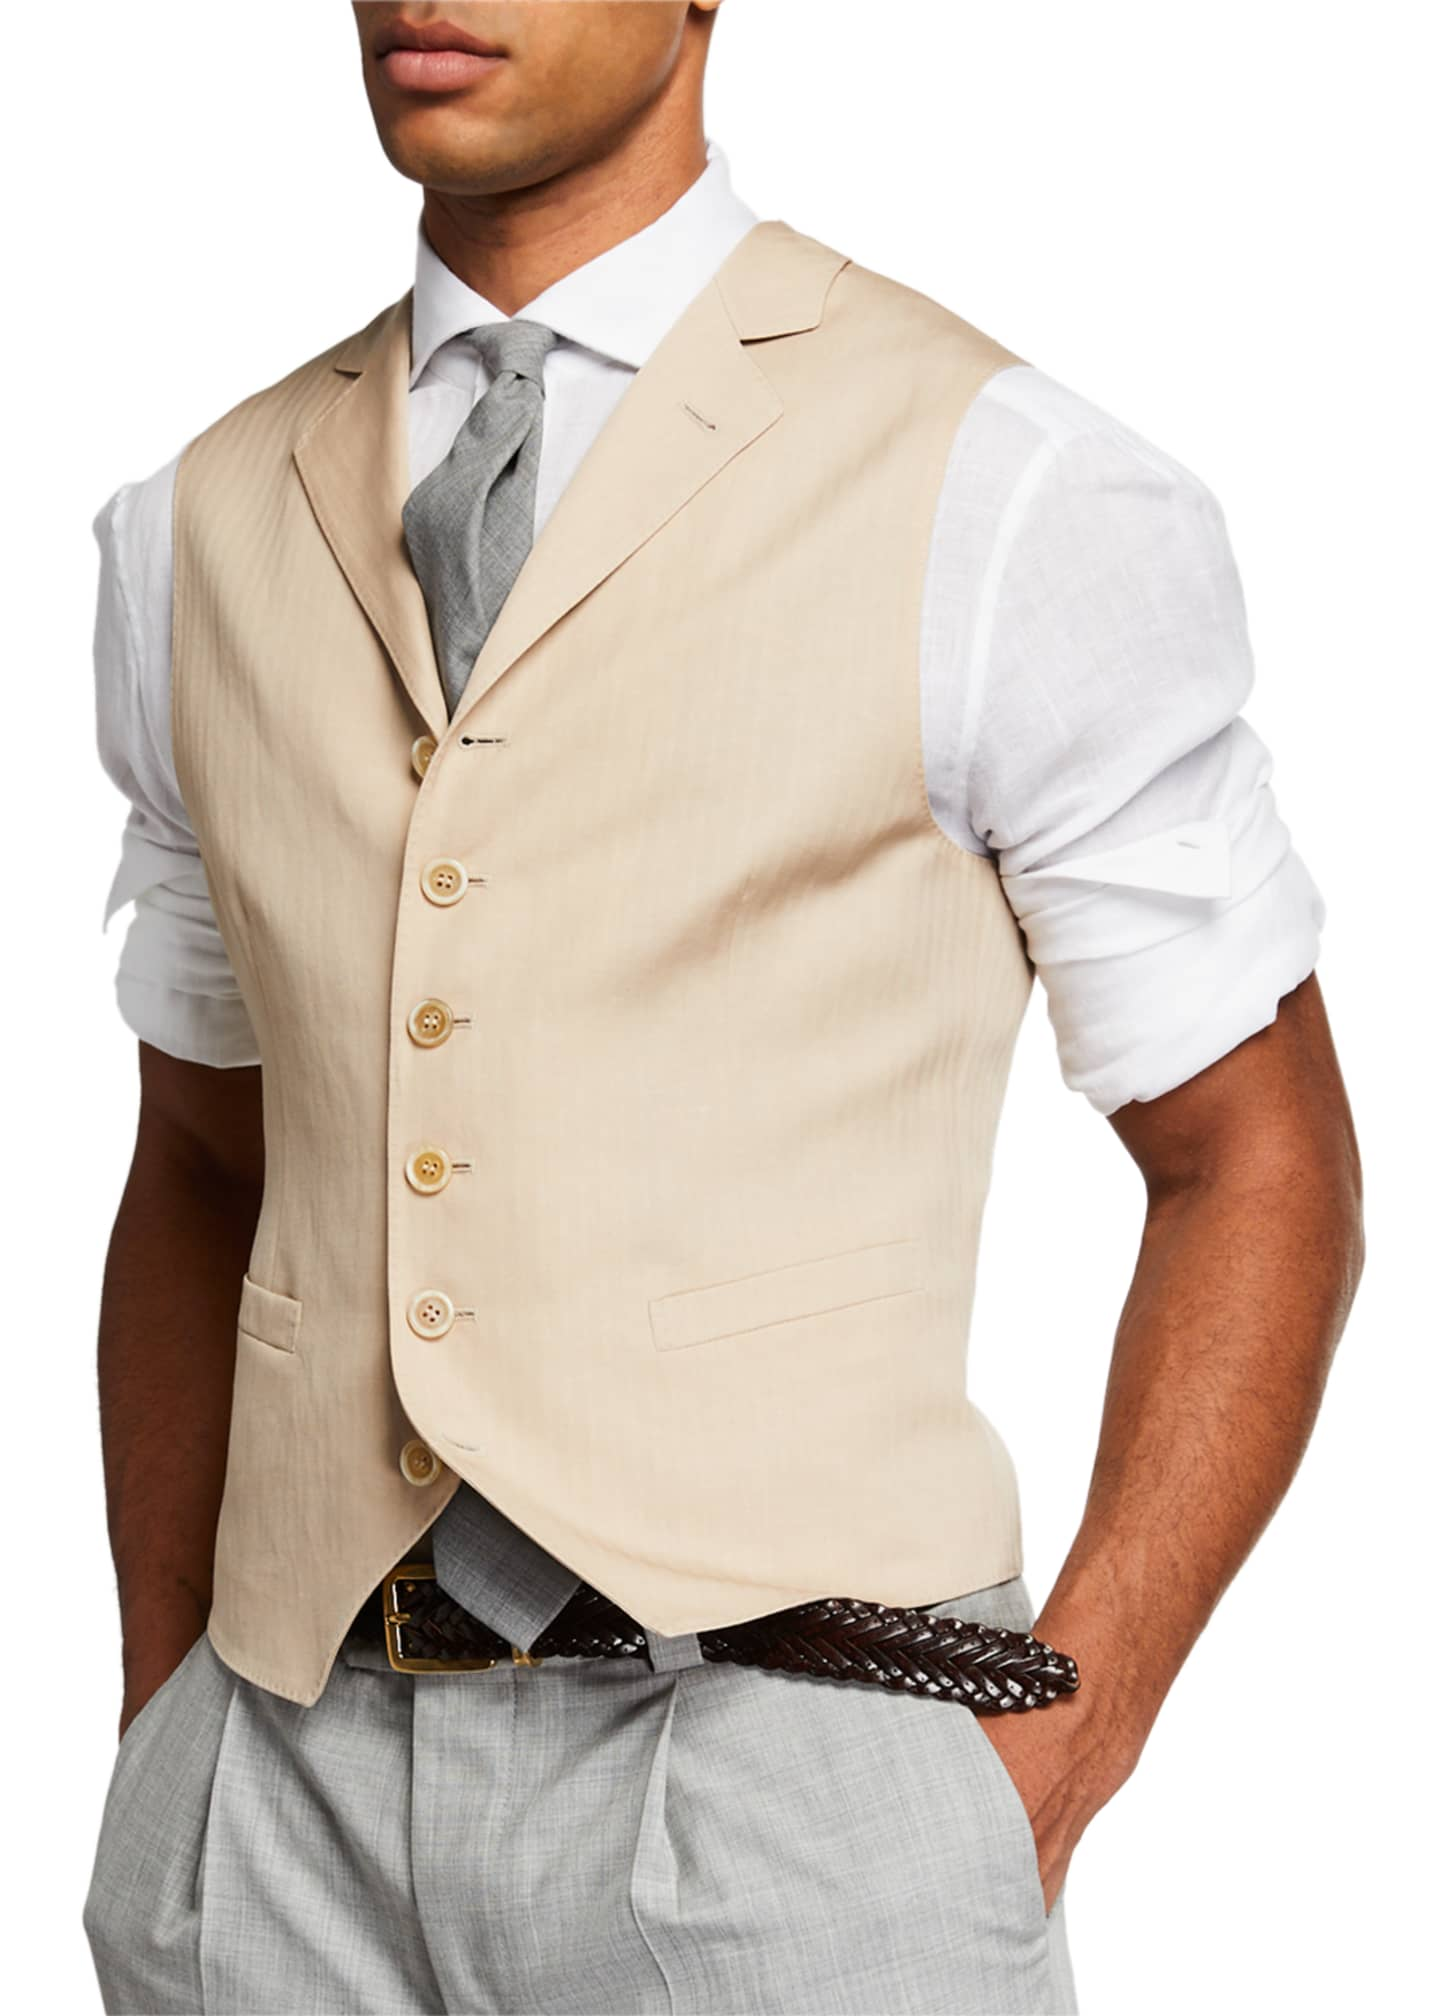 Brunello Cucinelli Men's Single Breasted Gilet Vest